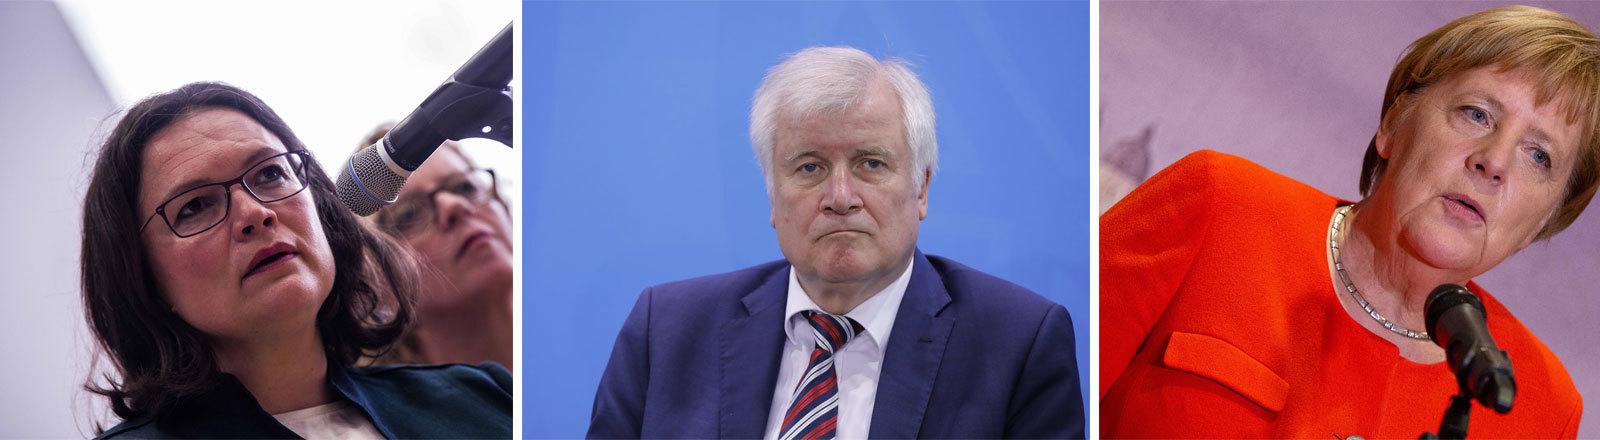 SPD-Vorsitzende Andrea Nahles, Bundesinnenminister Horst Seehofer (CSU), Bundeskanzlerin Angela Merkel (CDU)